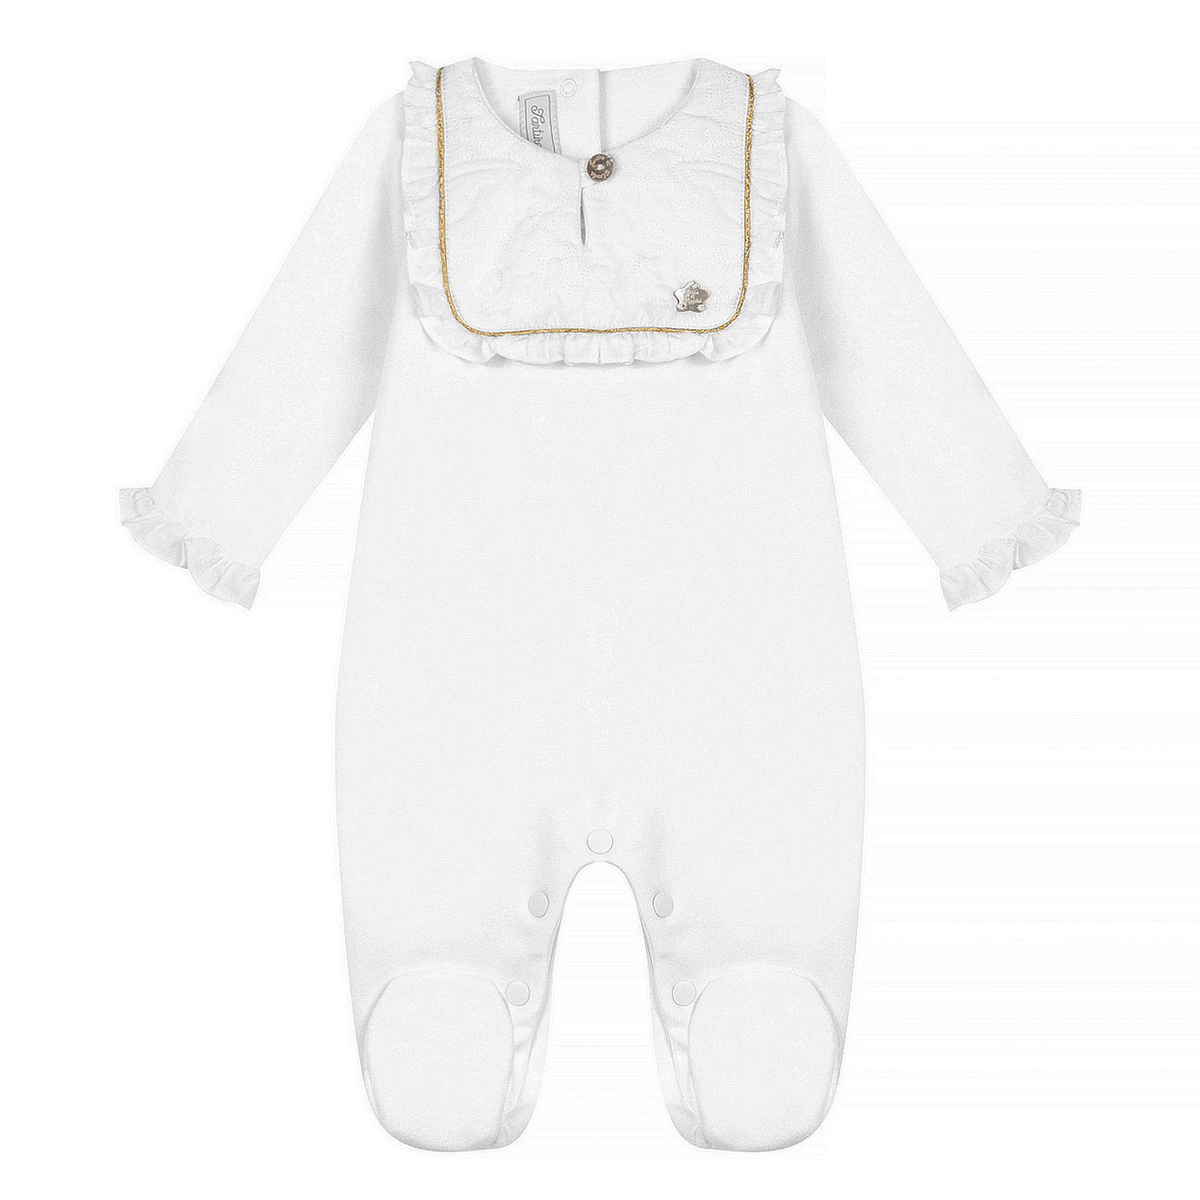 Body & Pyjama Pyjama Dors-Bien Monogramme Blanc - 1 Mois